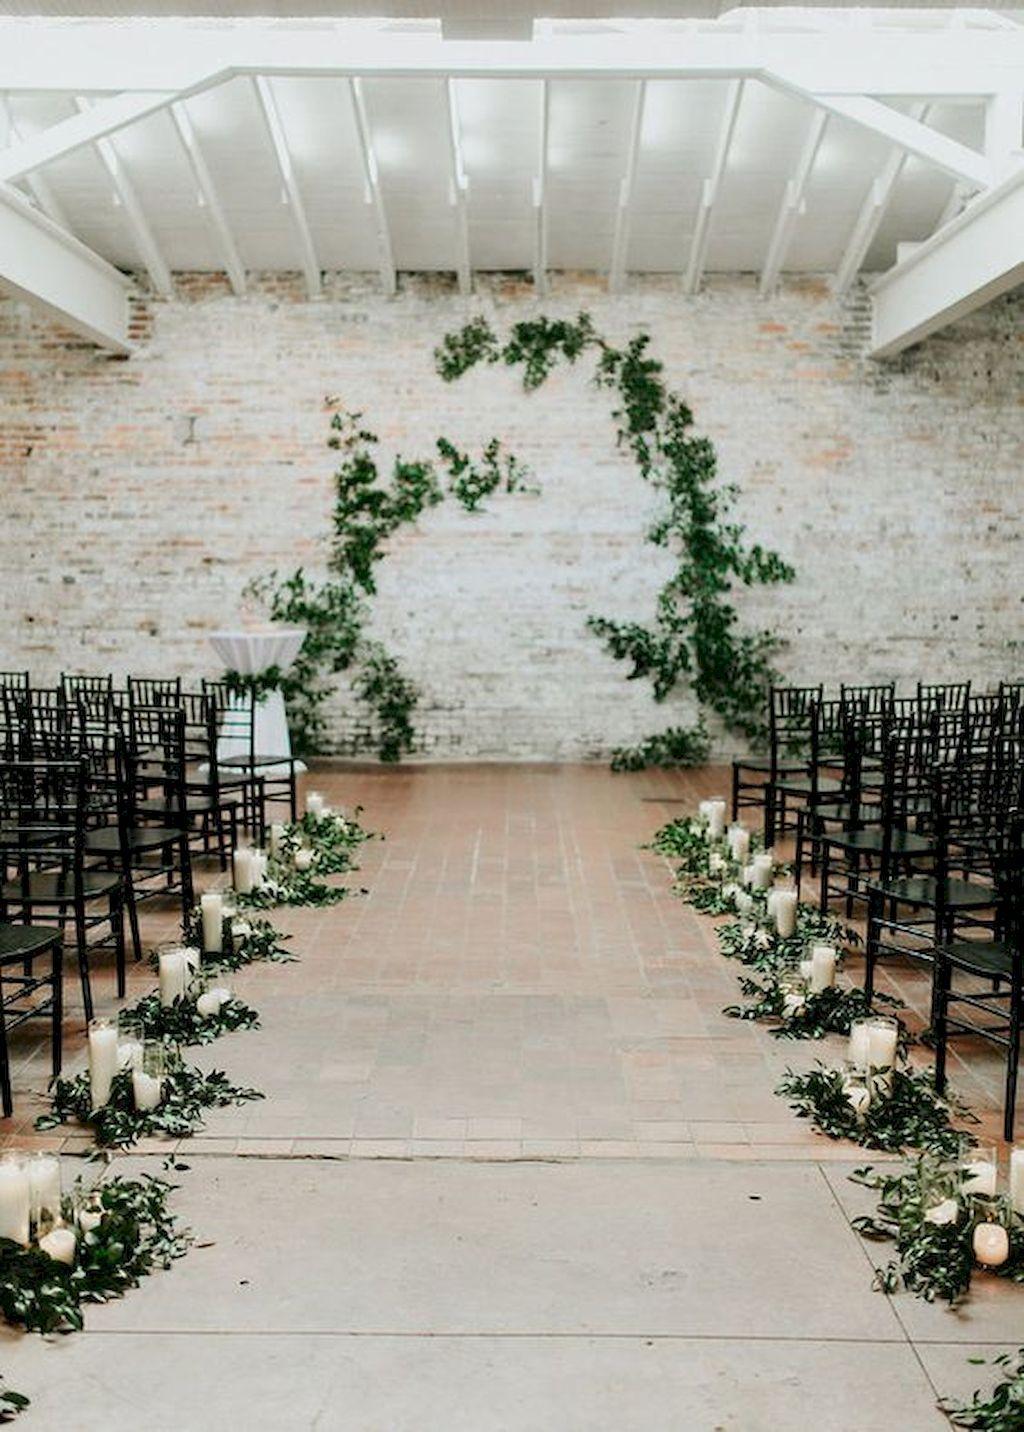 90 Greenery Wedding Decor Ideas | Pinterest | Greenery, Wedding ...